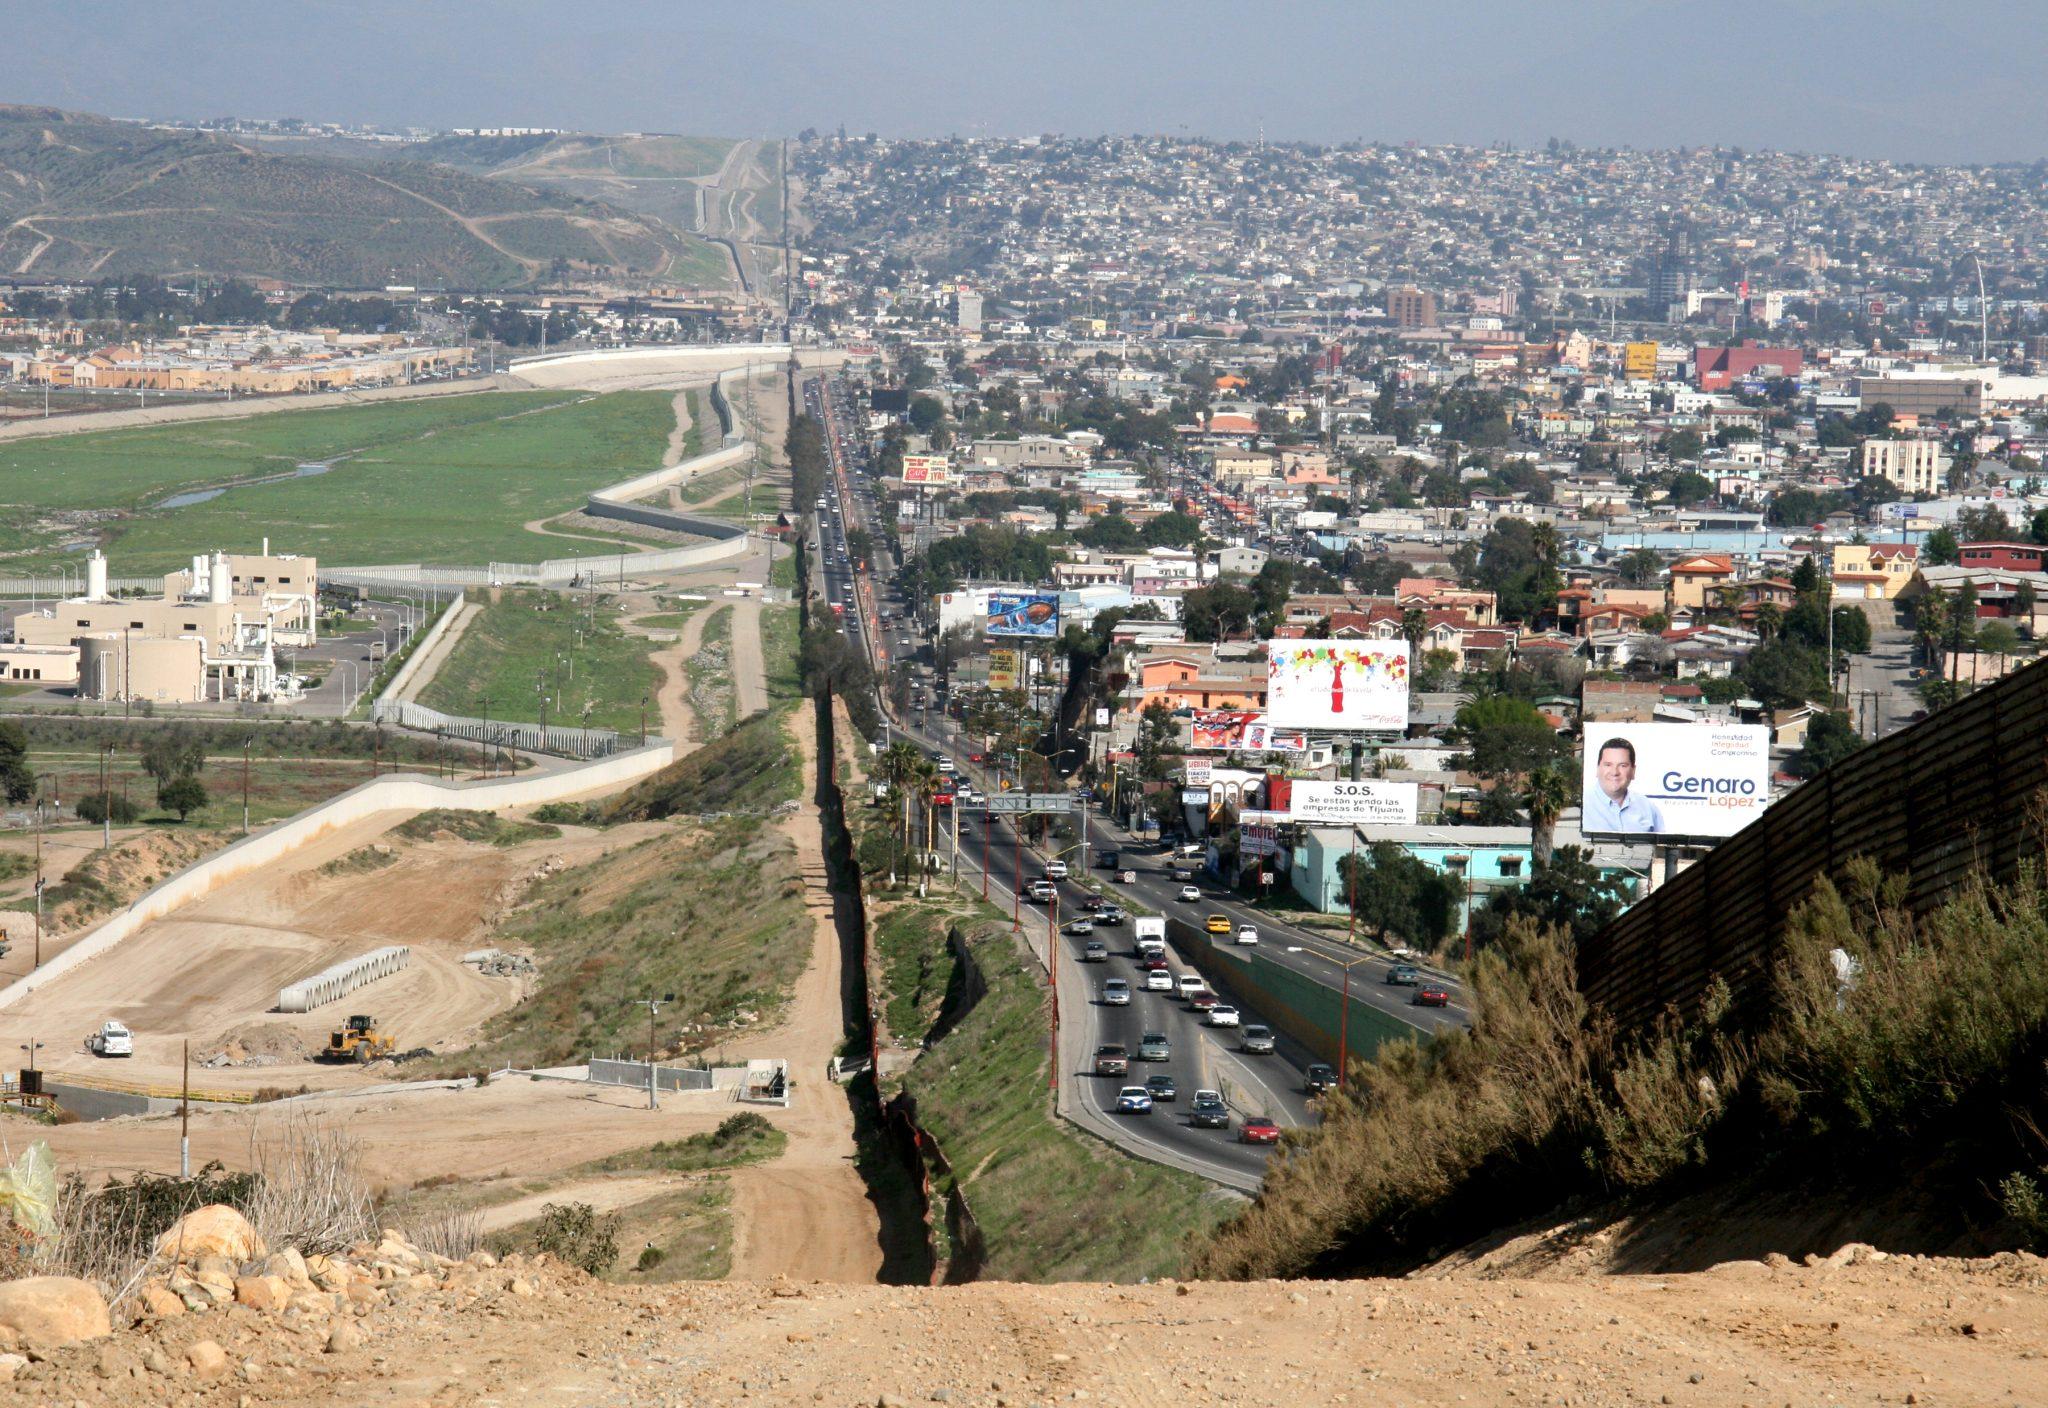 https://en.wikipedia.org/wiki/File:Border_USA_Mexico.jpg